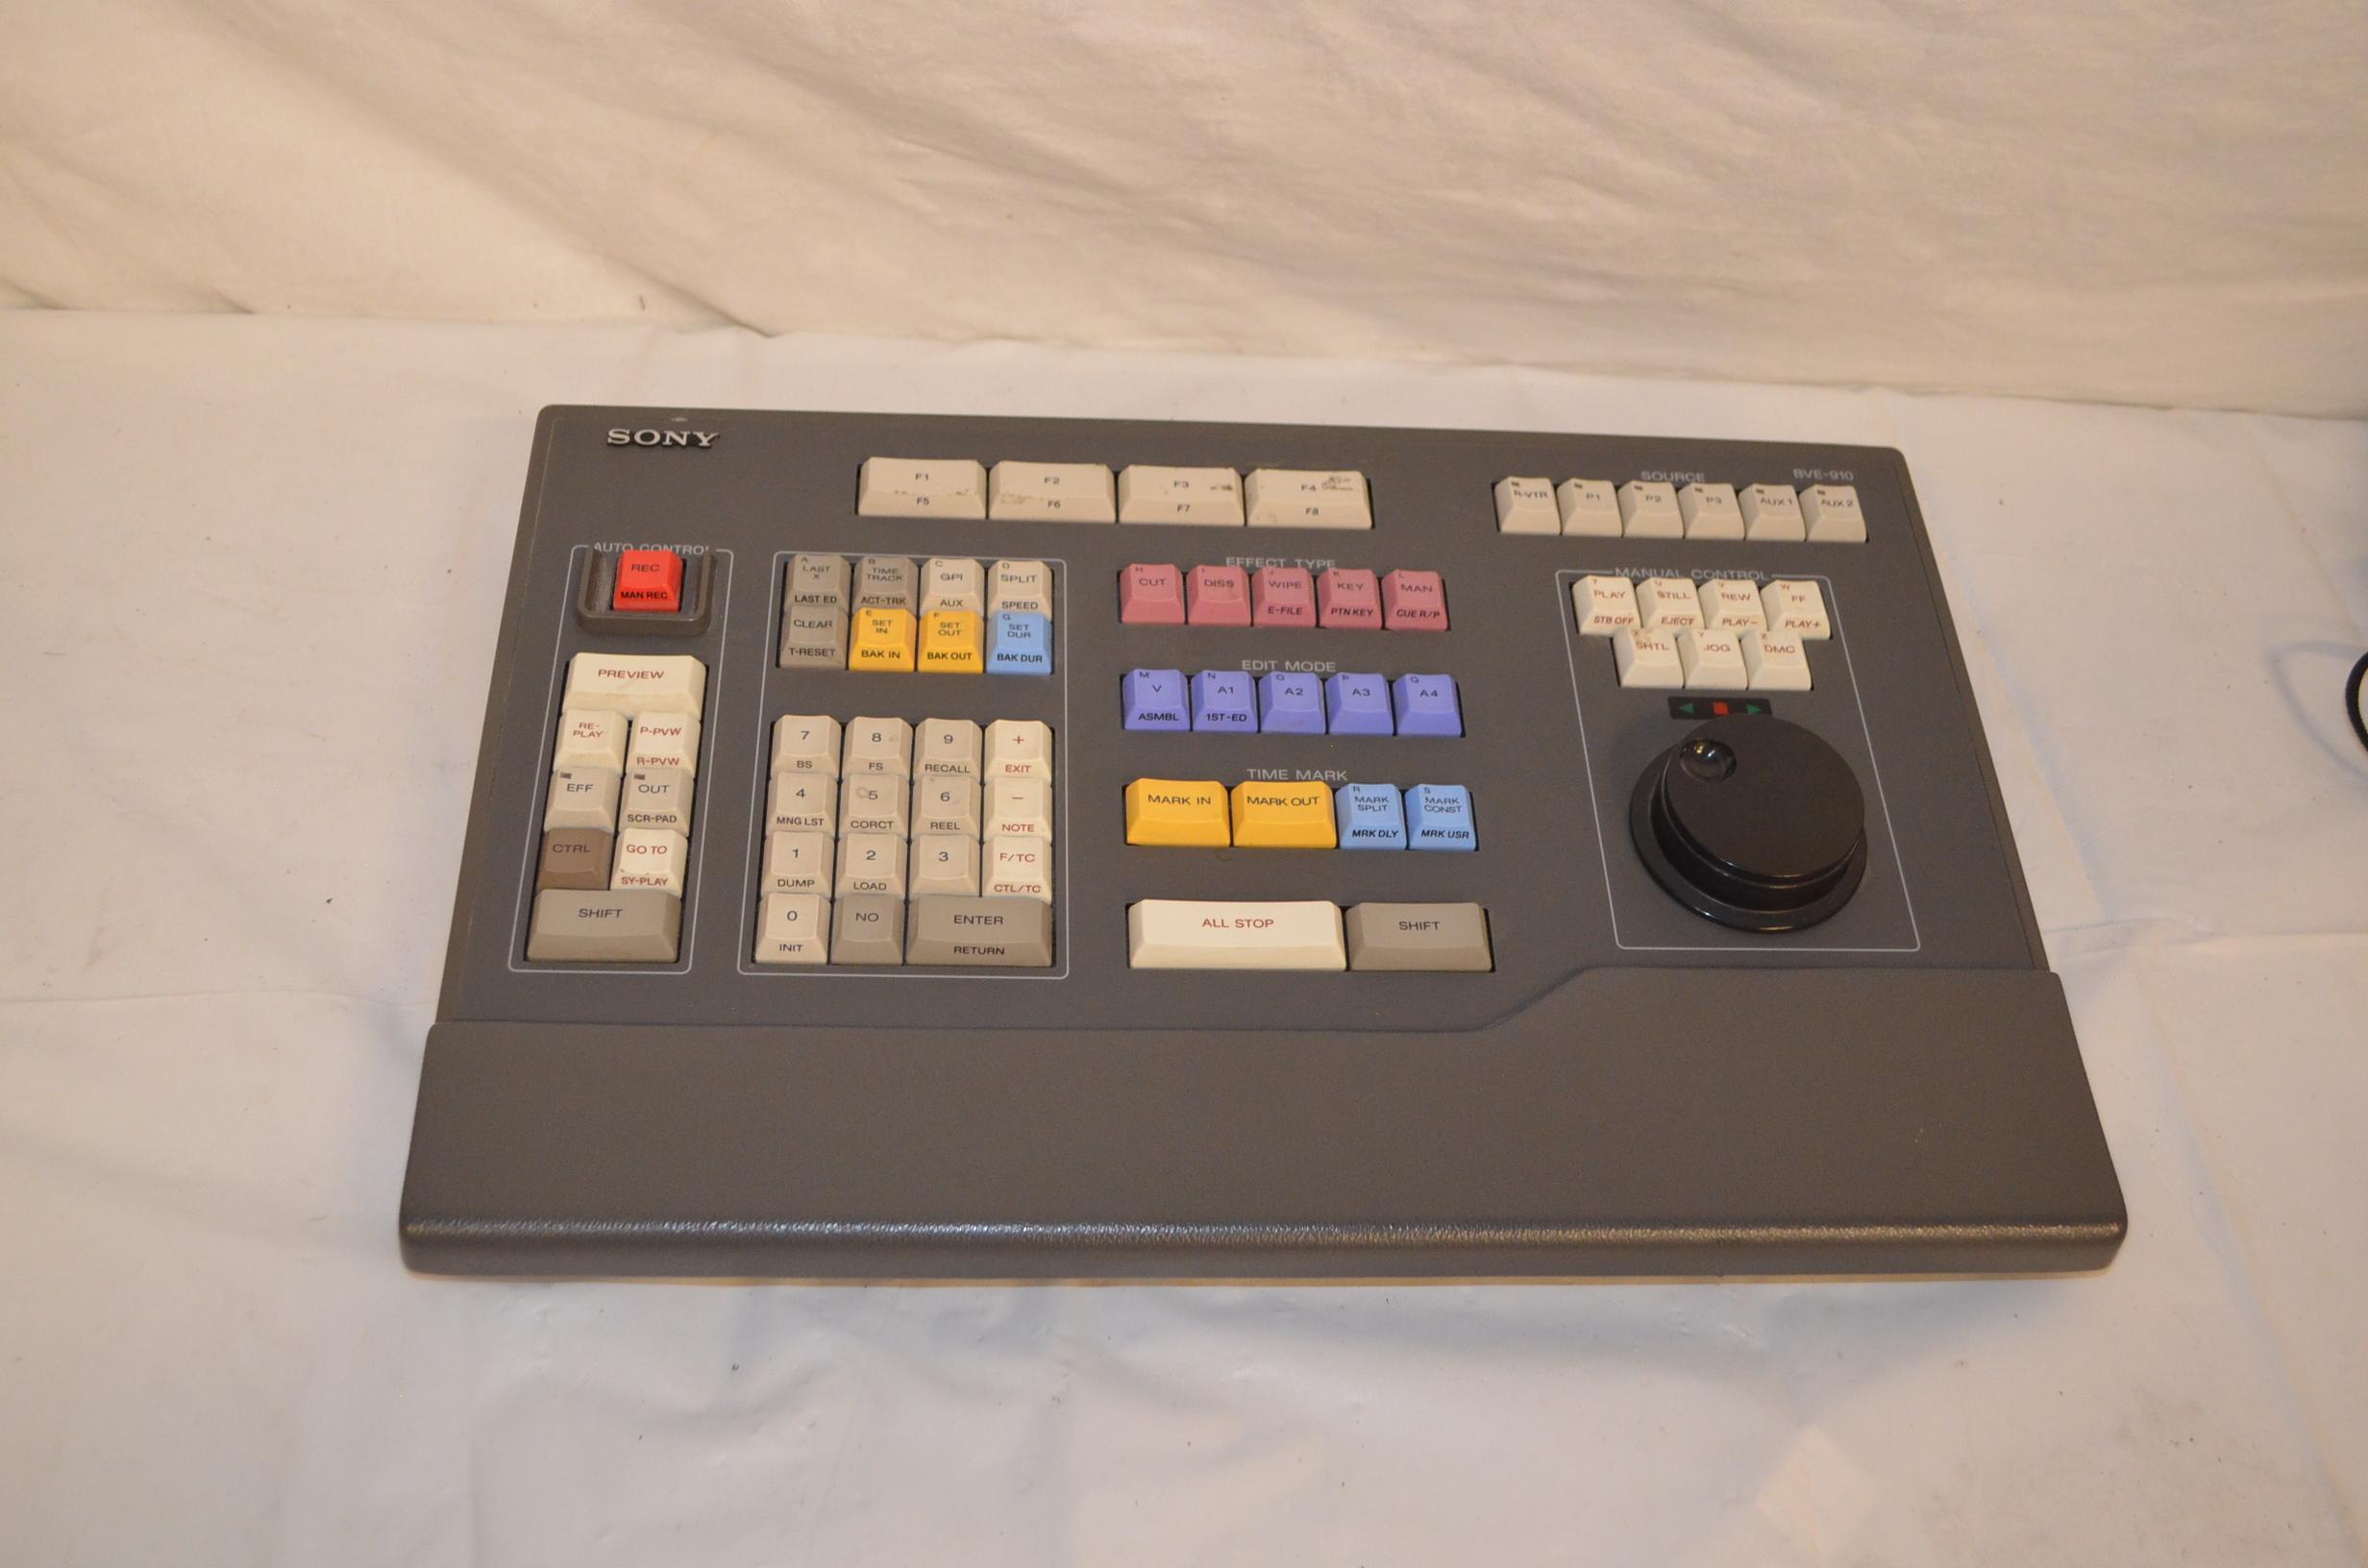 Sony Mixing board